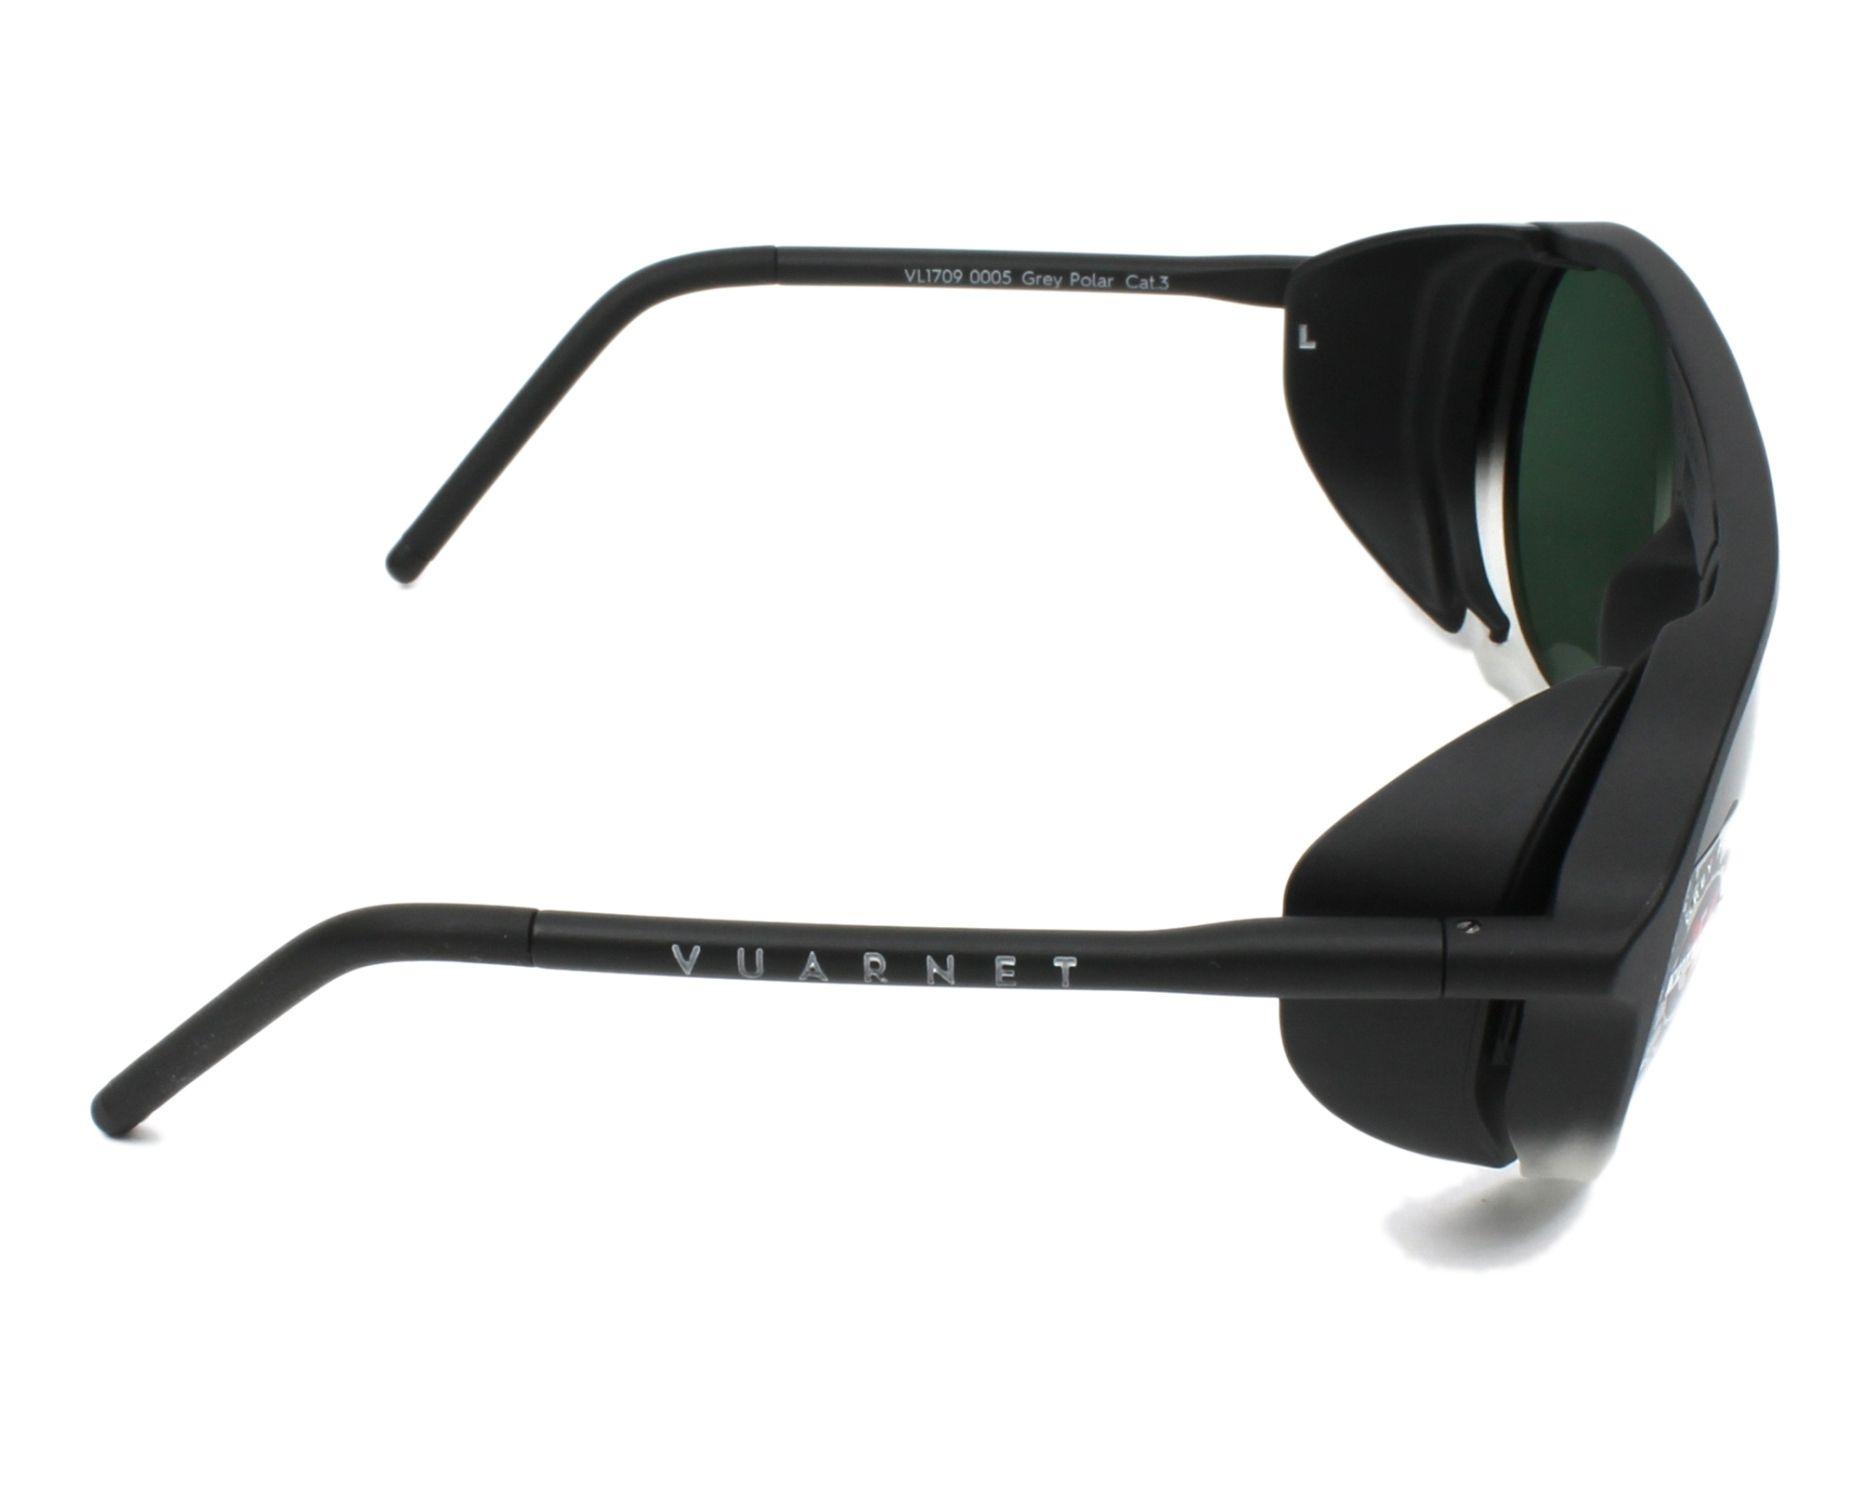 2fa0cc5d5dec3 Sunglasses Vuarnet VL-1709 0005-1622 51-18 Black Crystal side view